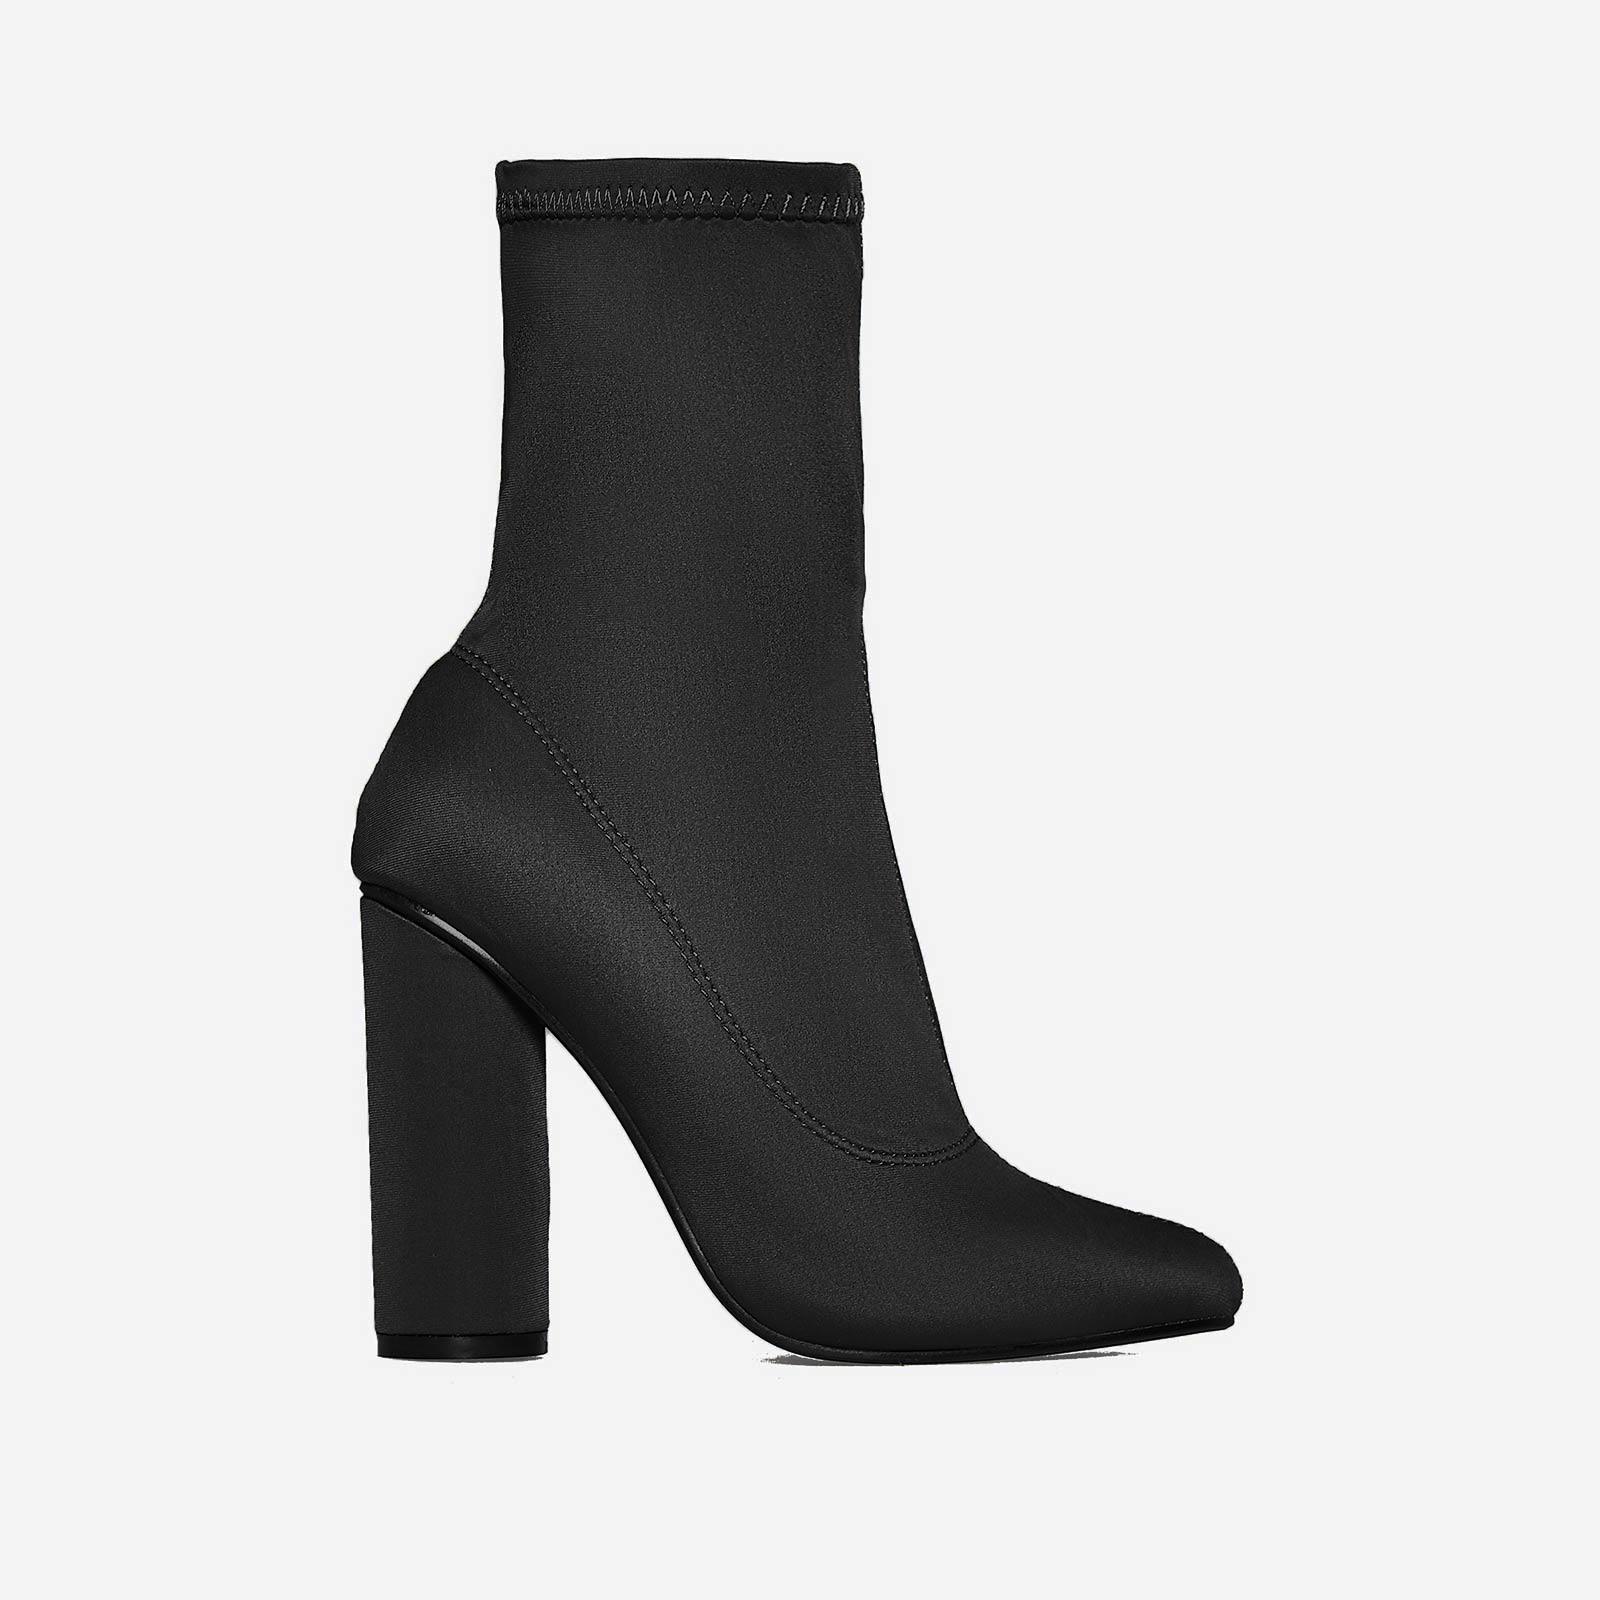 Noelle Block Heel Ankle Boot In Black Lycra